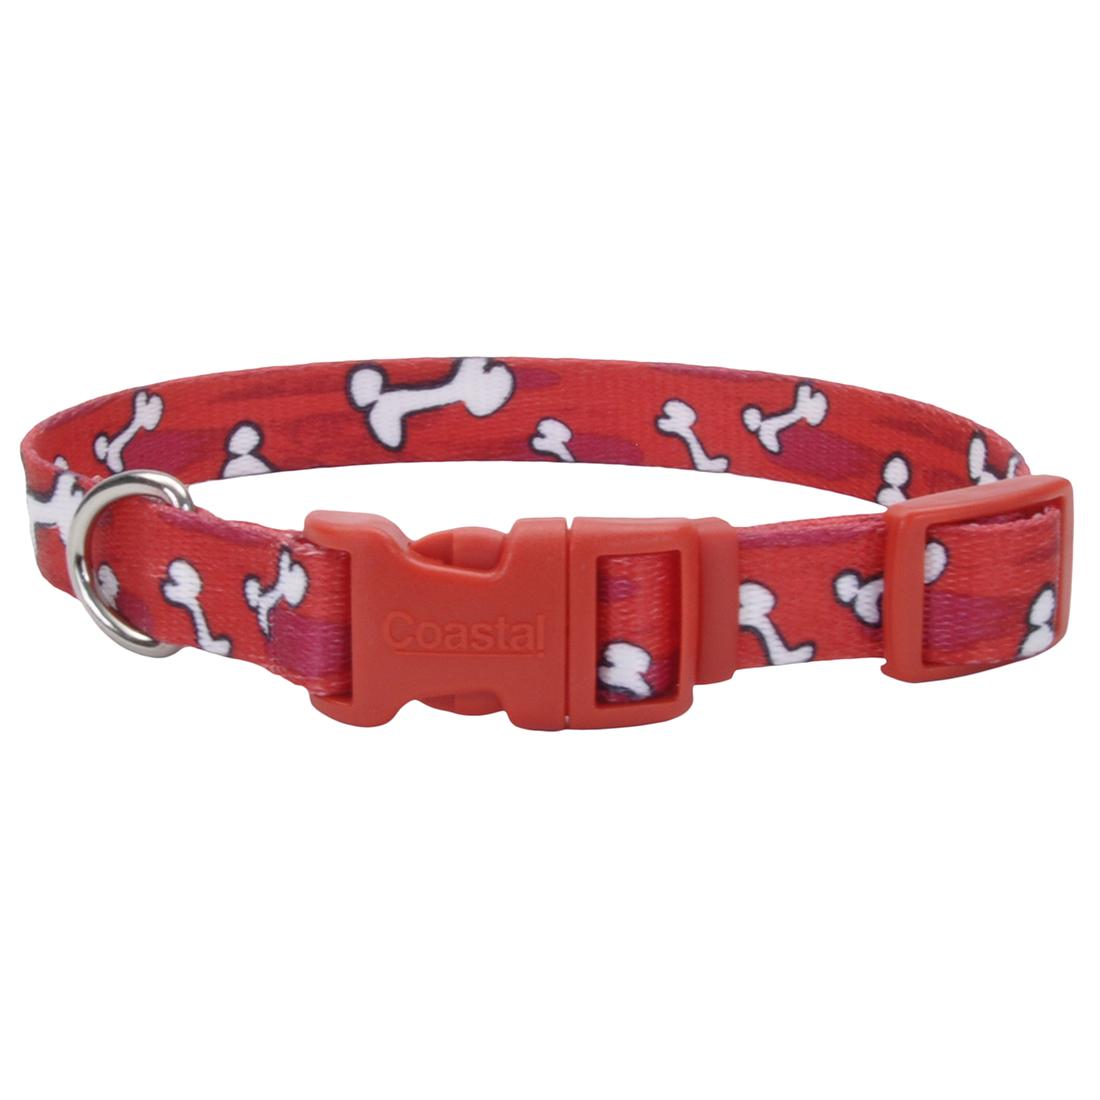 Small Dog Collars Petsmart